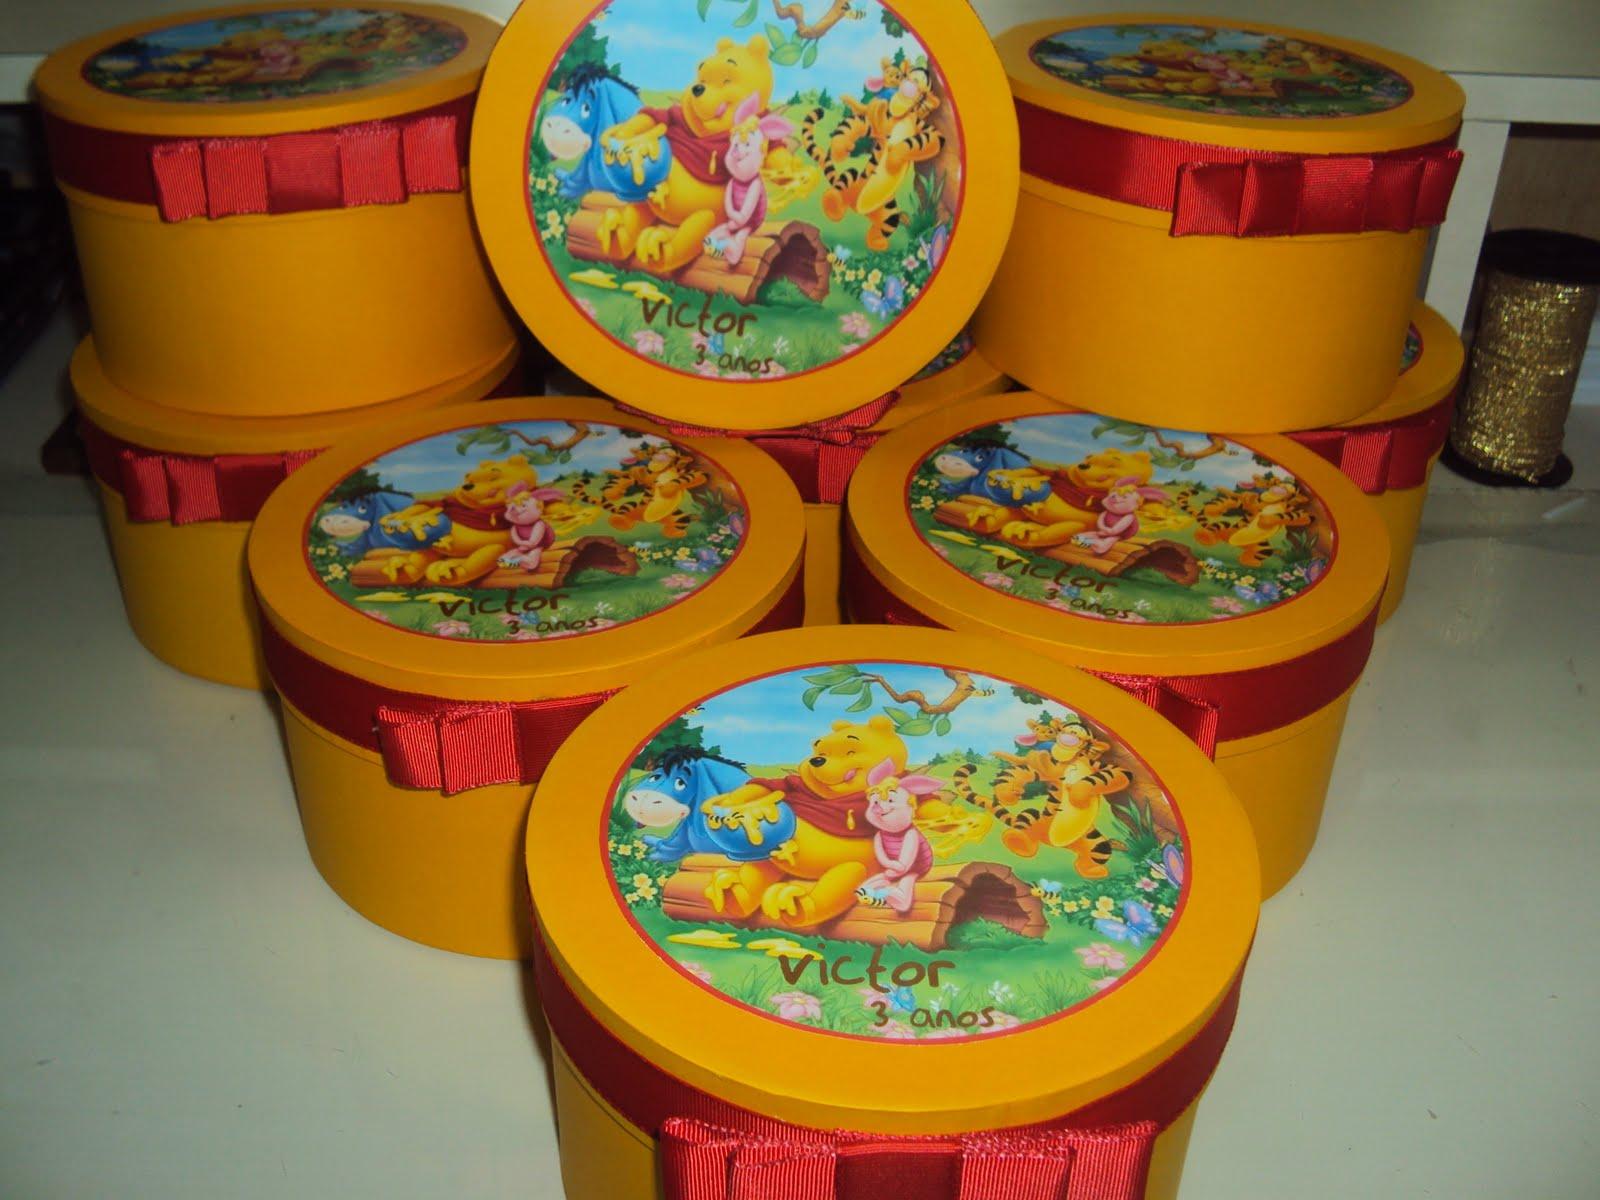 Related image with Festa Infantil Tema Ursinho Pooh Pelautscom Picture